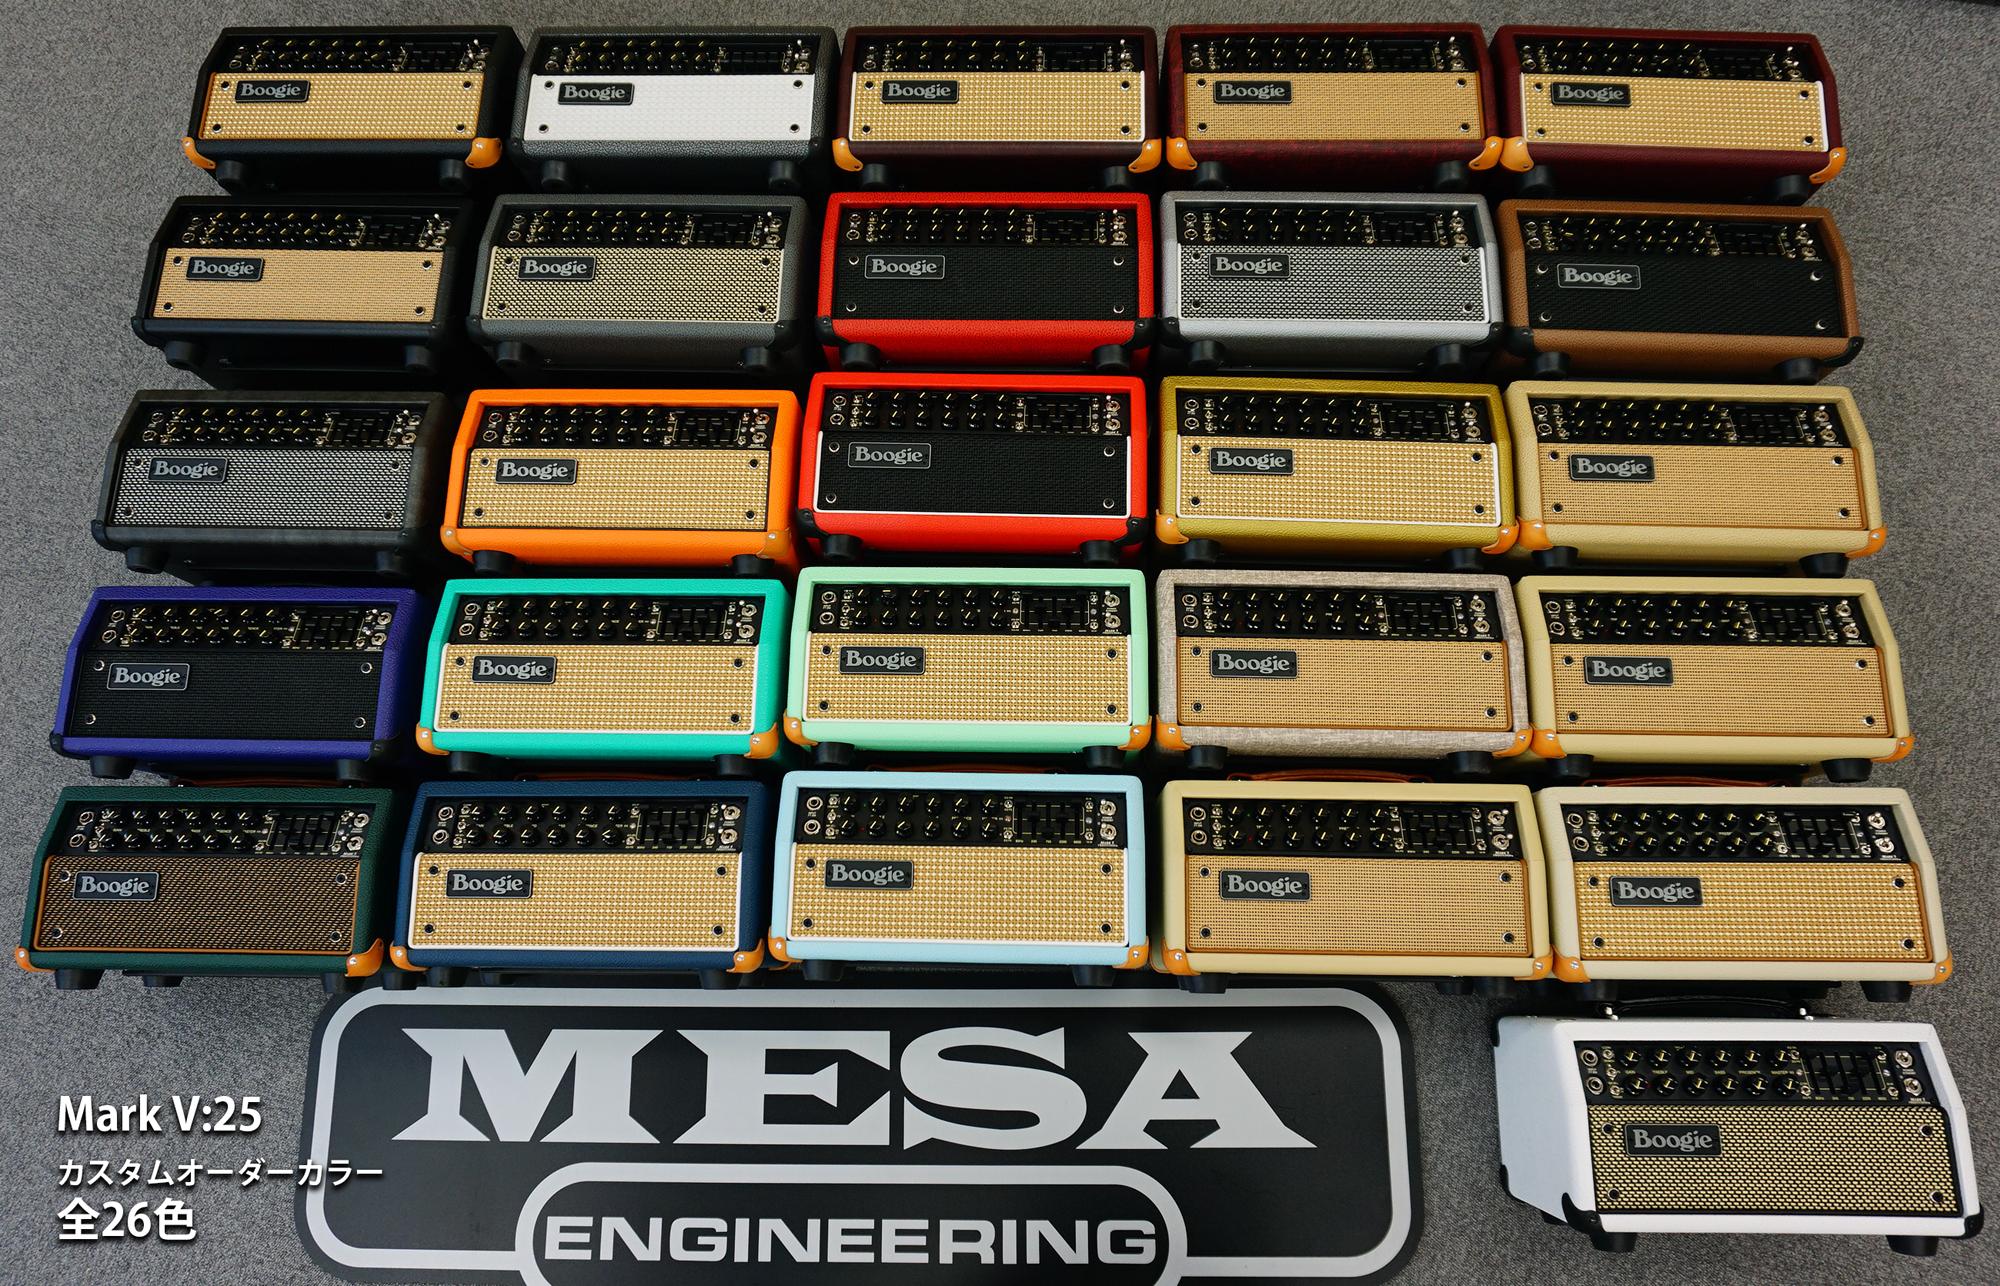 MESA/Boogie Mark V:25 カスタムオーダーカラー全26色 発売!